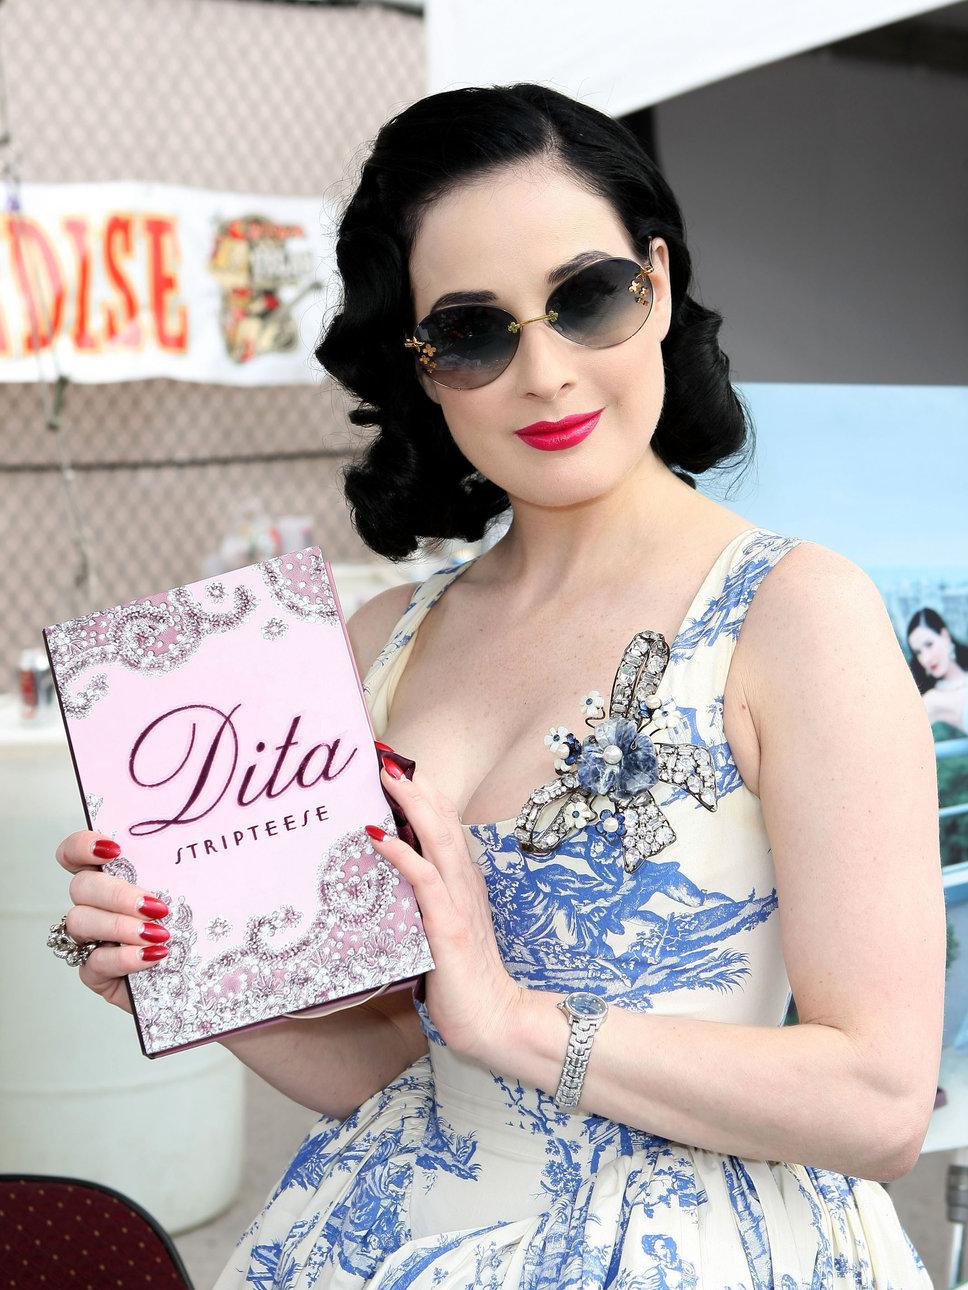 Inspiration beauté vintage: Dita Von Teese